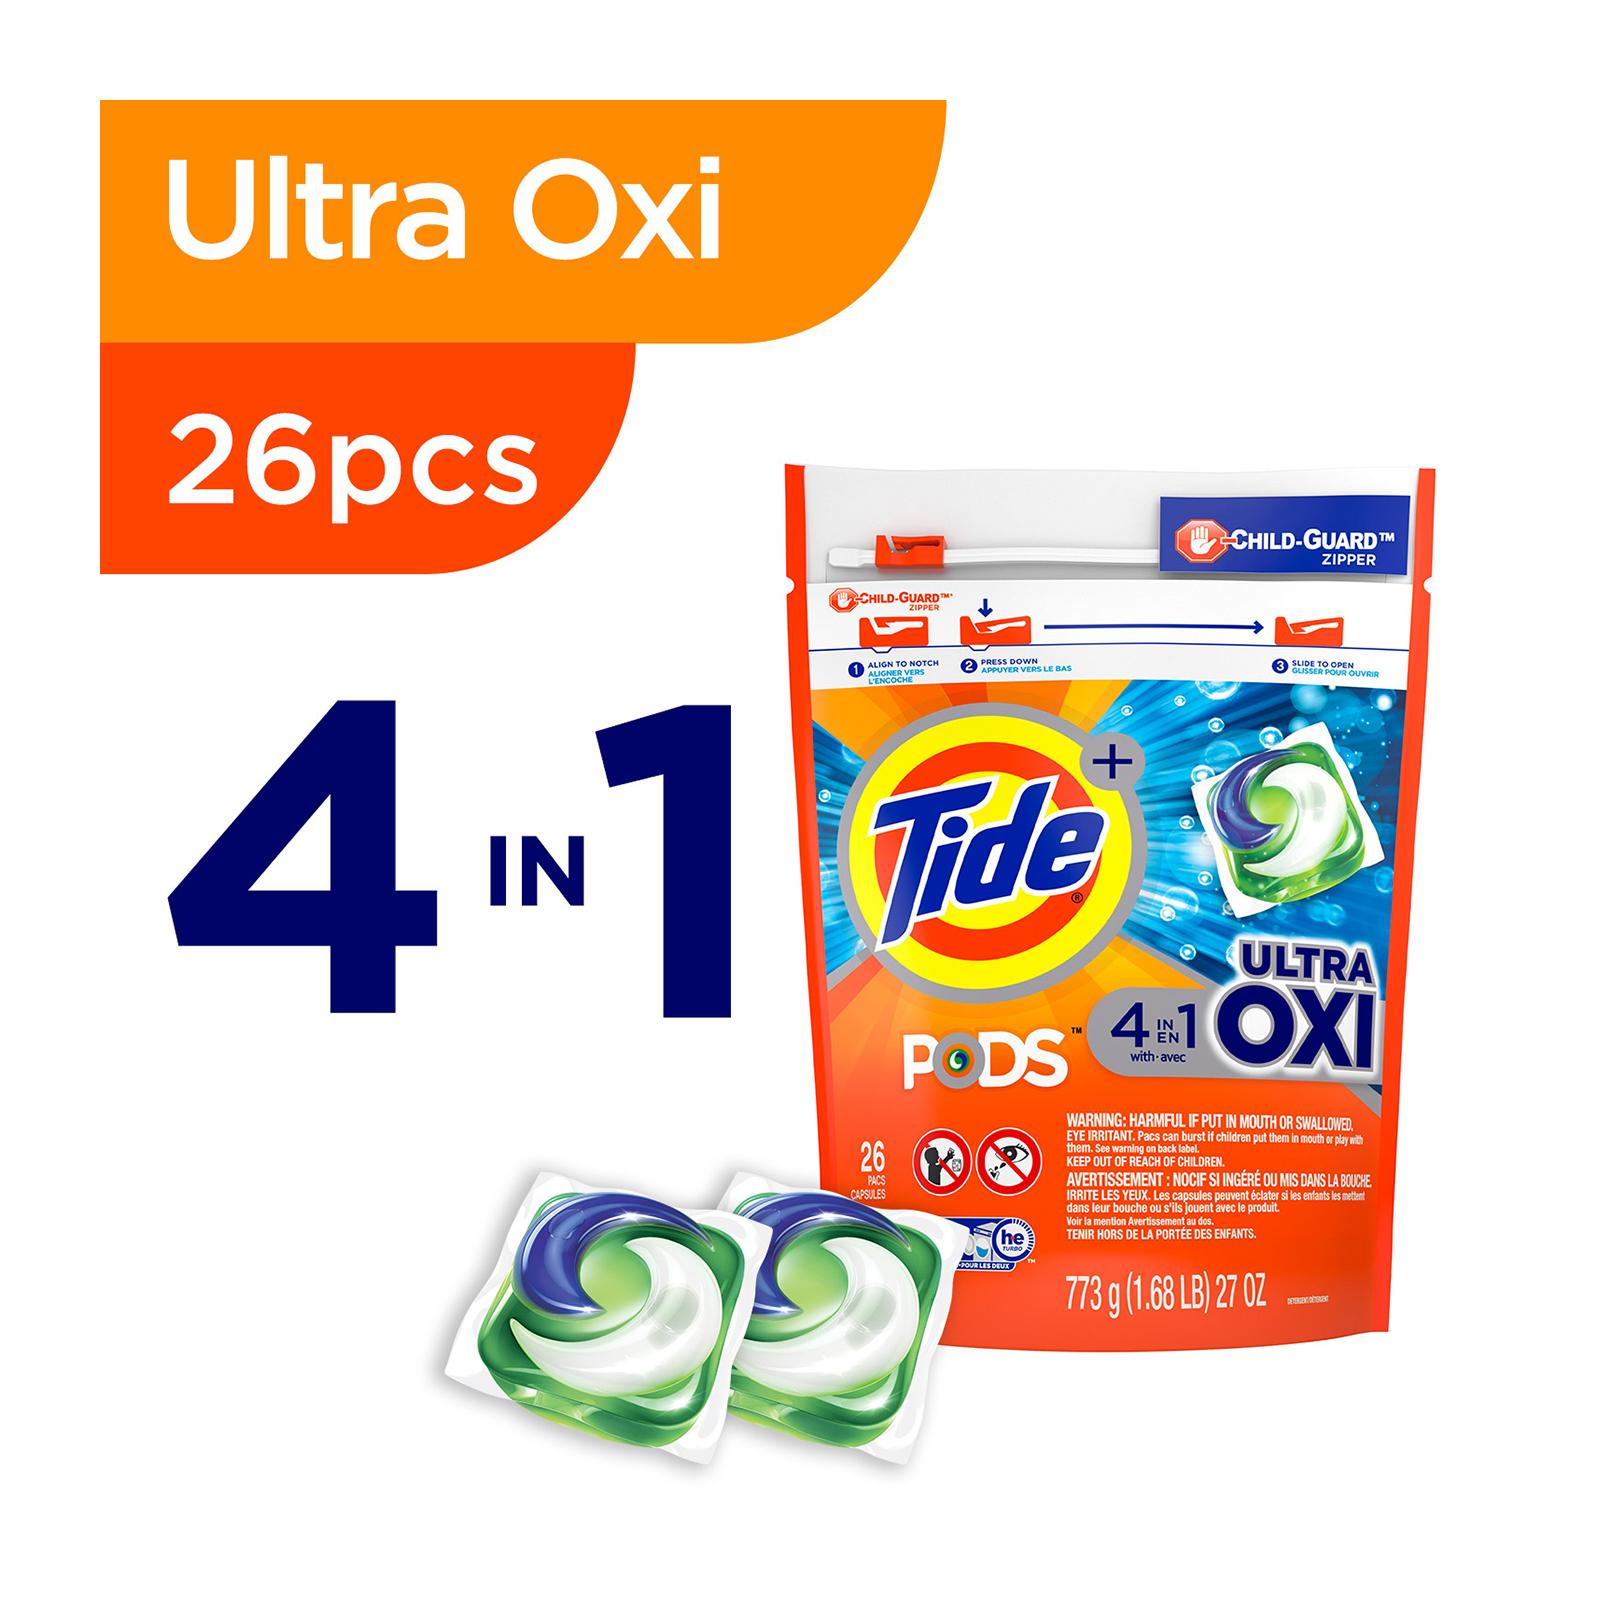 Tide Pods Ultra Oxi Laundry Detergent Pacs 26 PCS